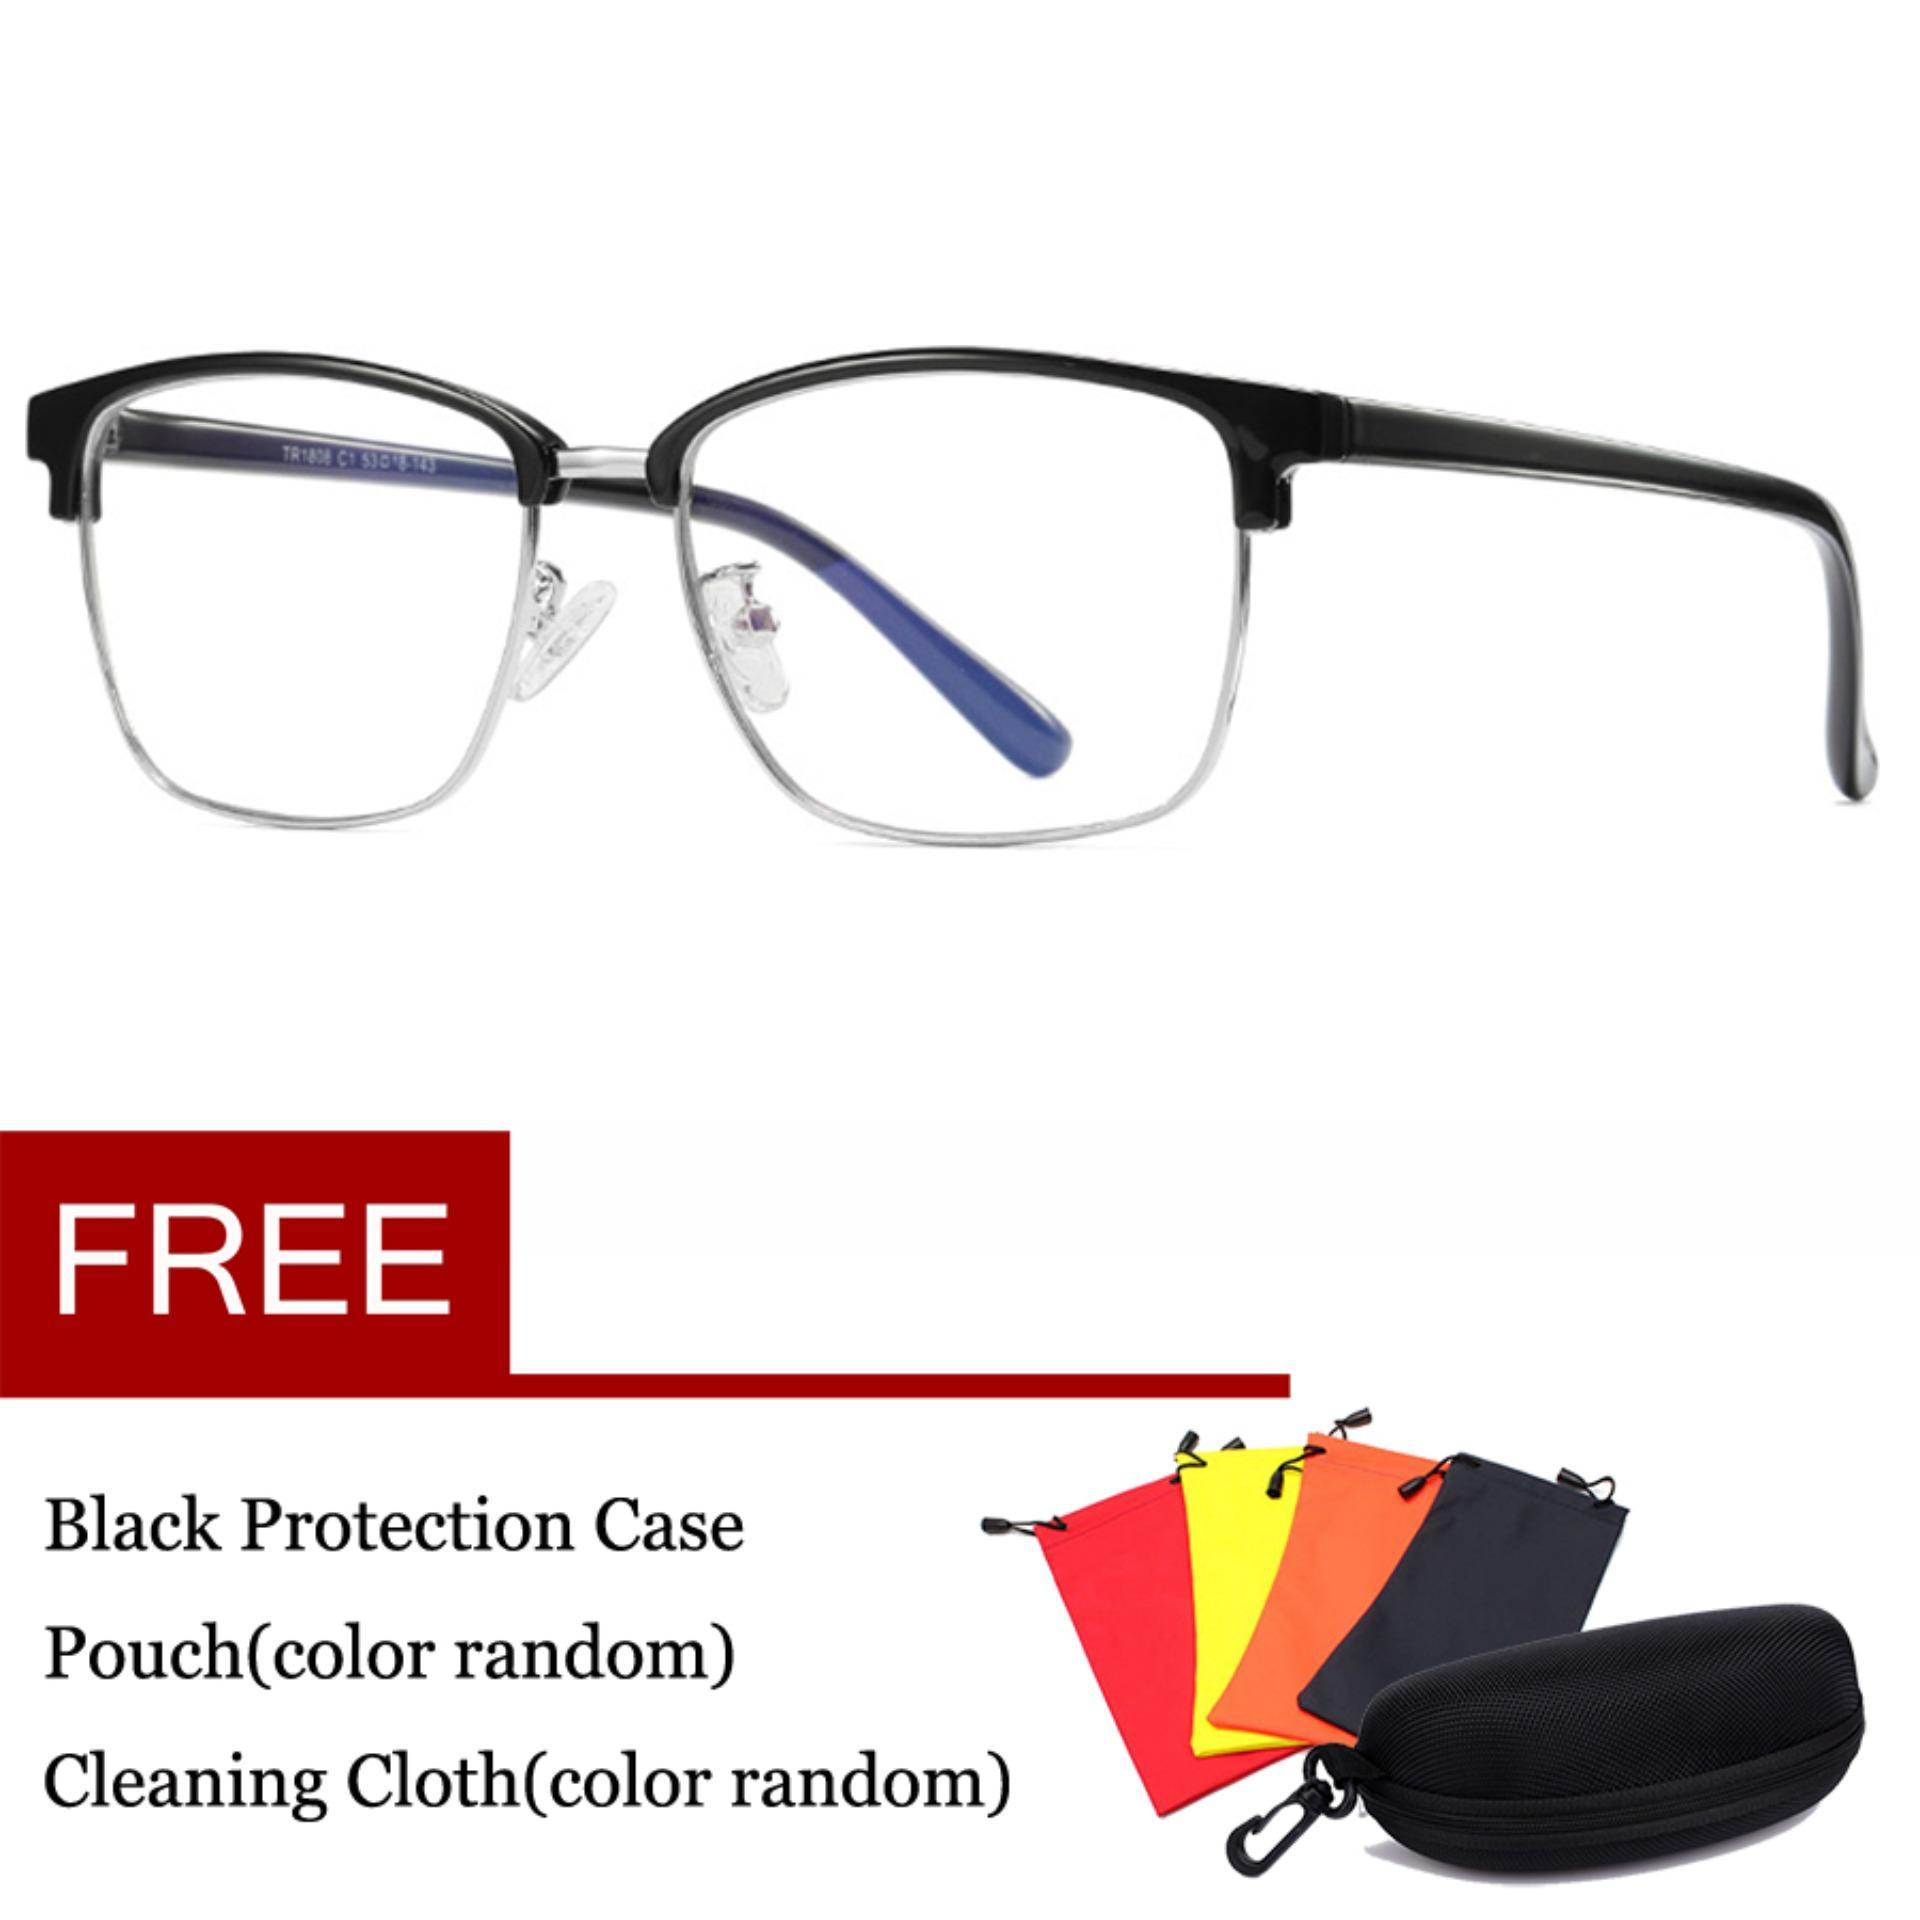 Komputer Kacamata Game Anti Cahaya Biru Kacamata Anti-silau Anti Silau  Tegangan Mata Lensa Perlindungan 6018ae25e1